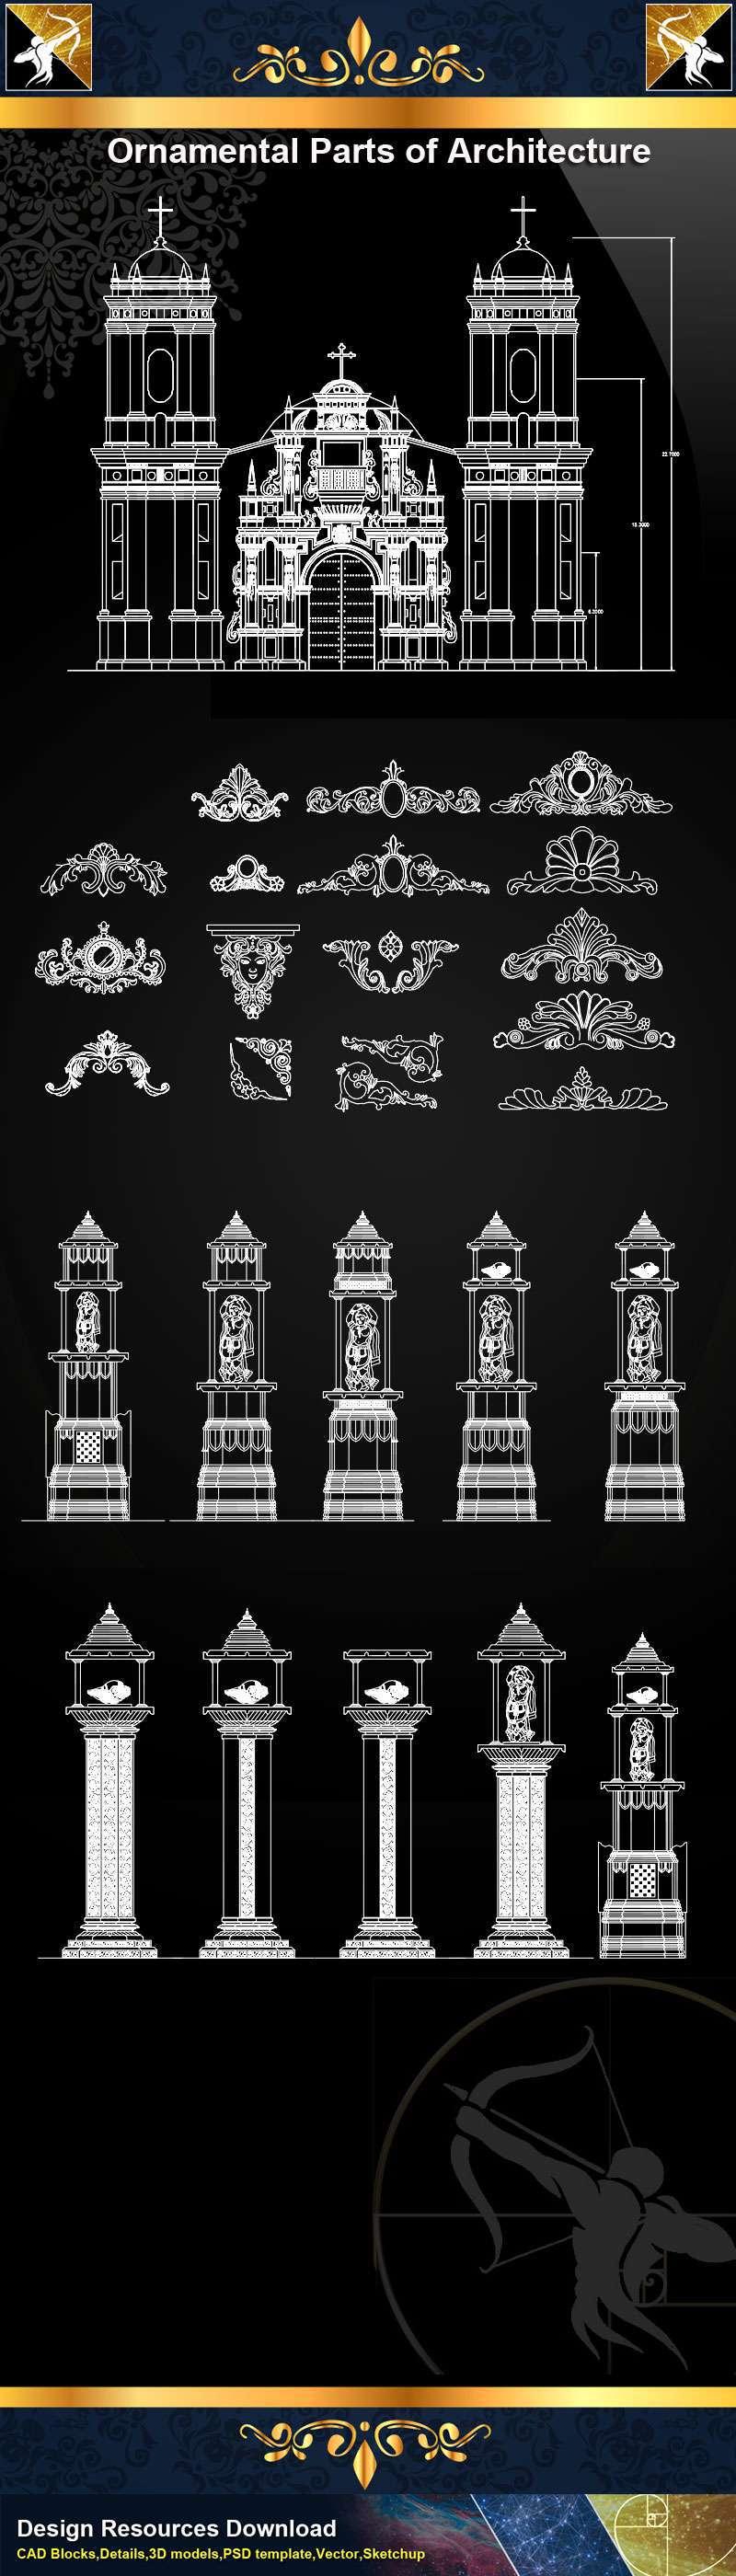 ★【Ornamental Parts of Architecture -Decoration Element CAD Blocks V.6】@Autocad Decoration Blocks,Drawings,CAD Details,Elevation